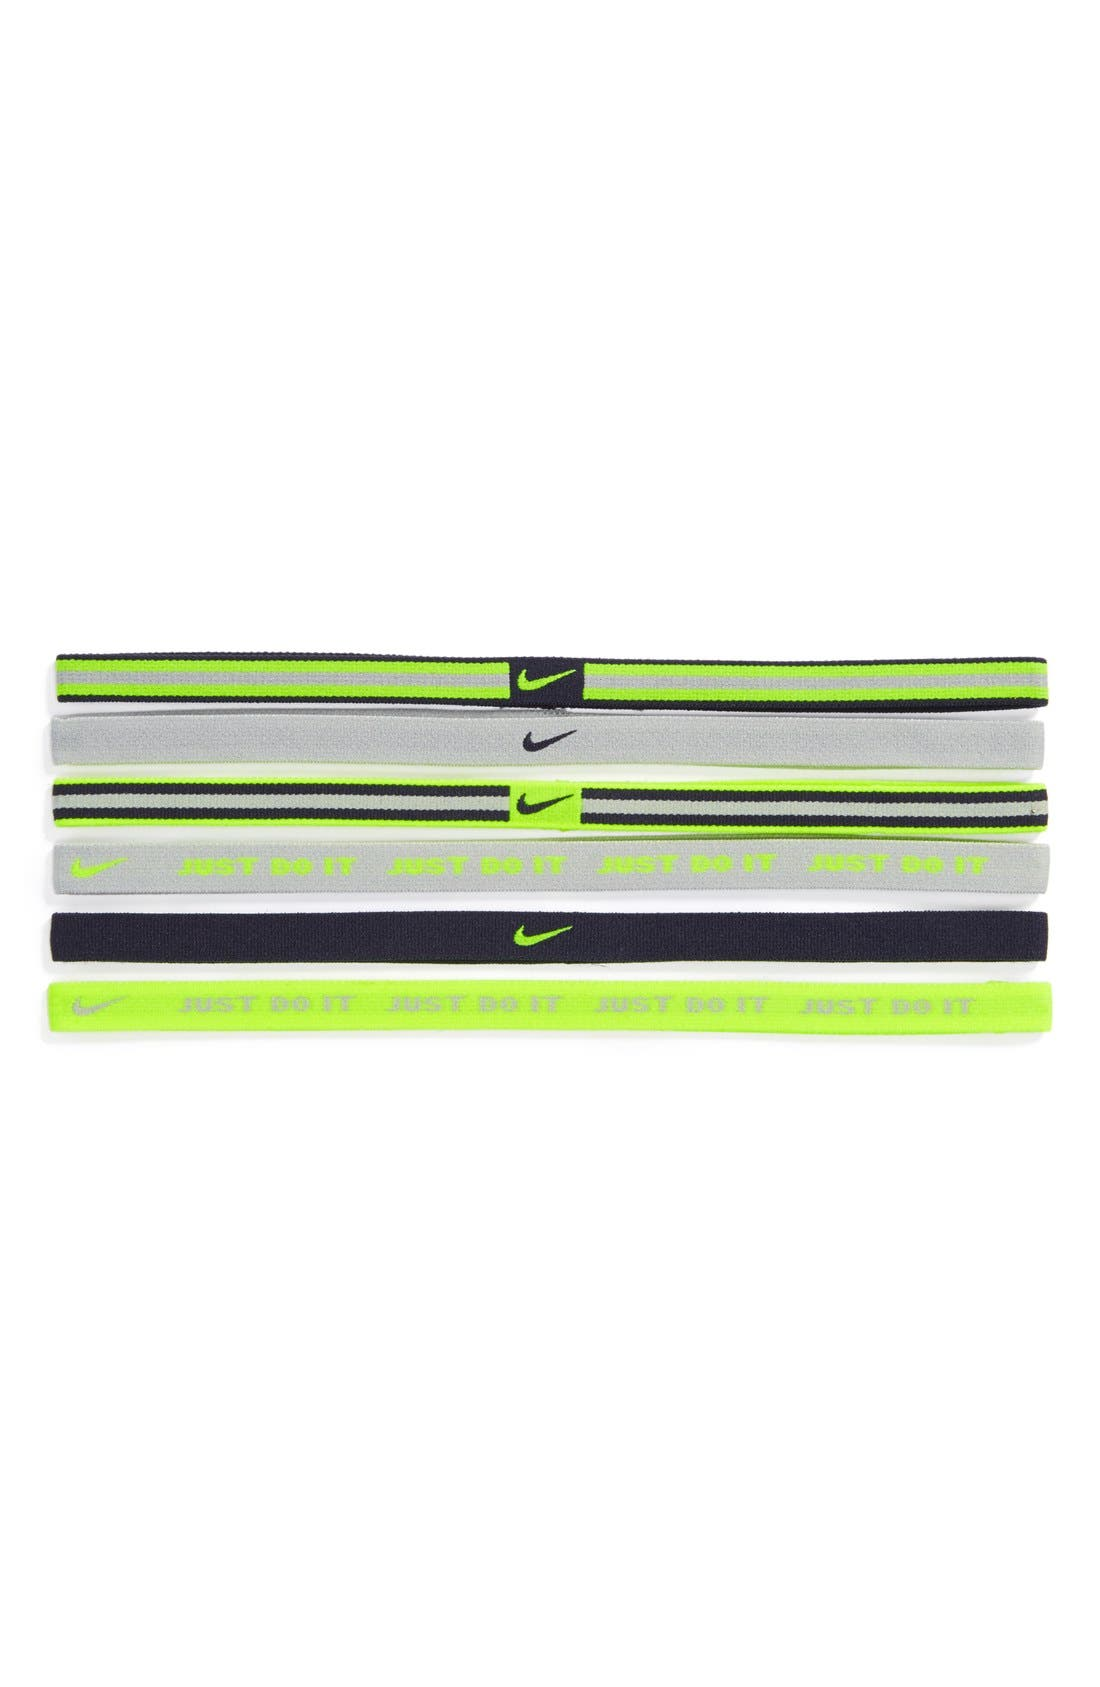 Main Image - Nike Wide Sport Headband (6-Pack)